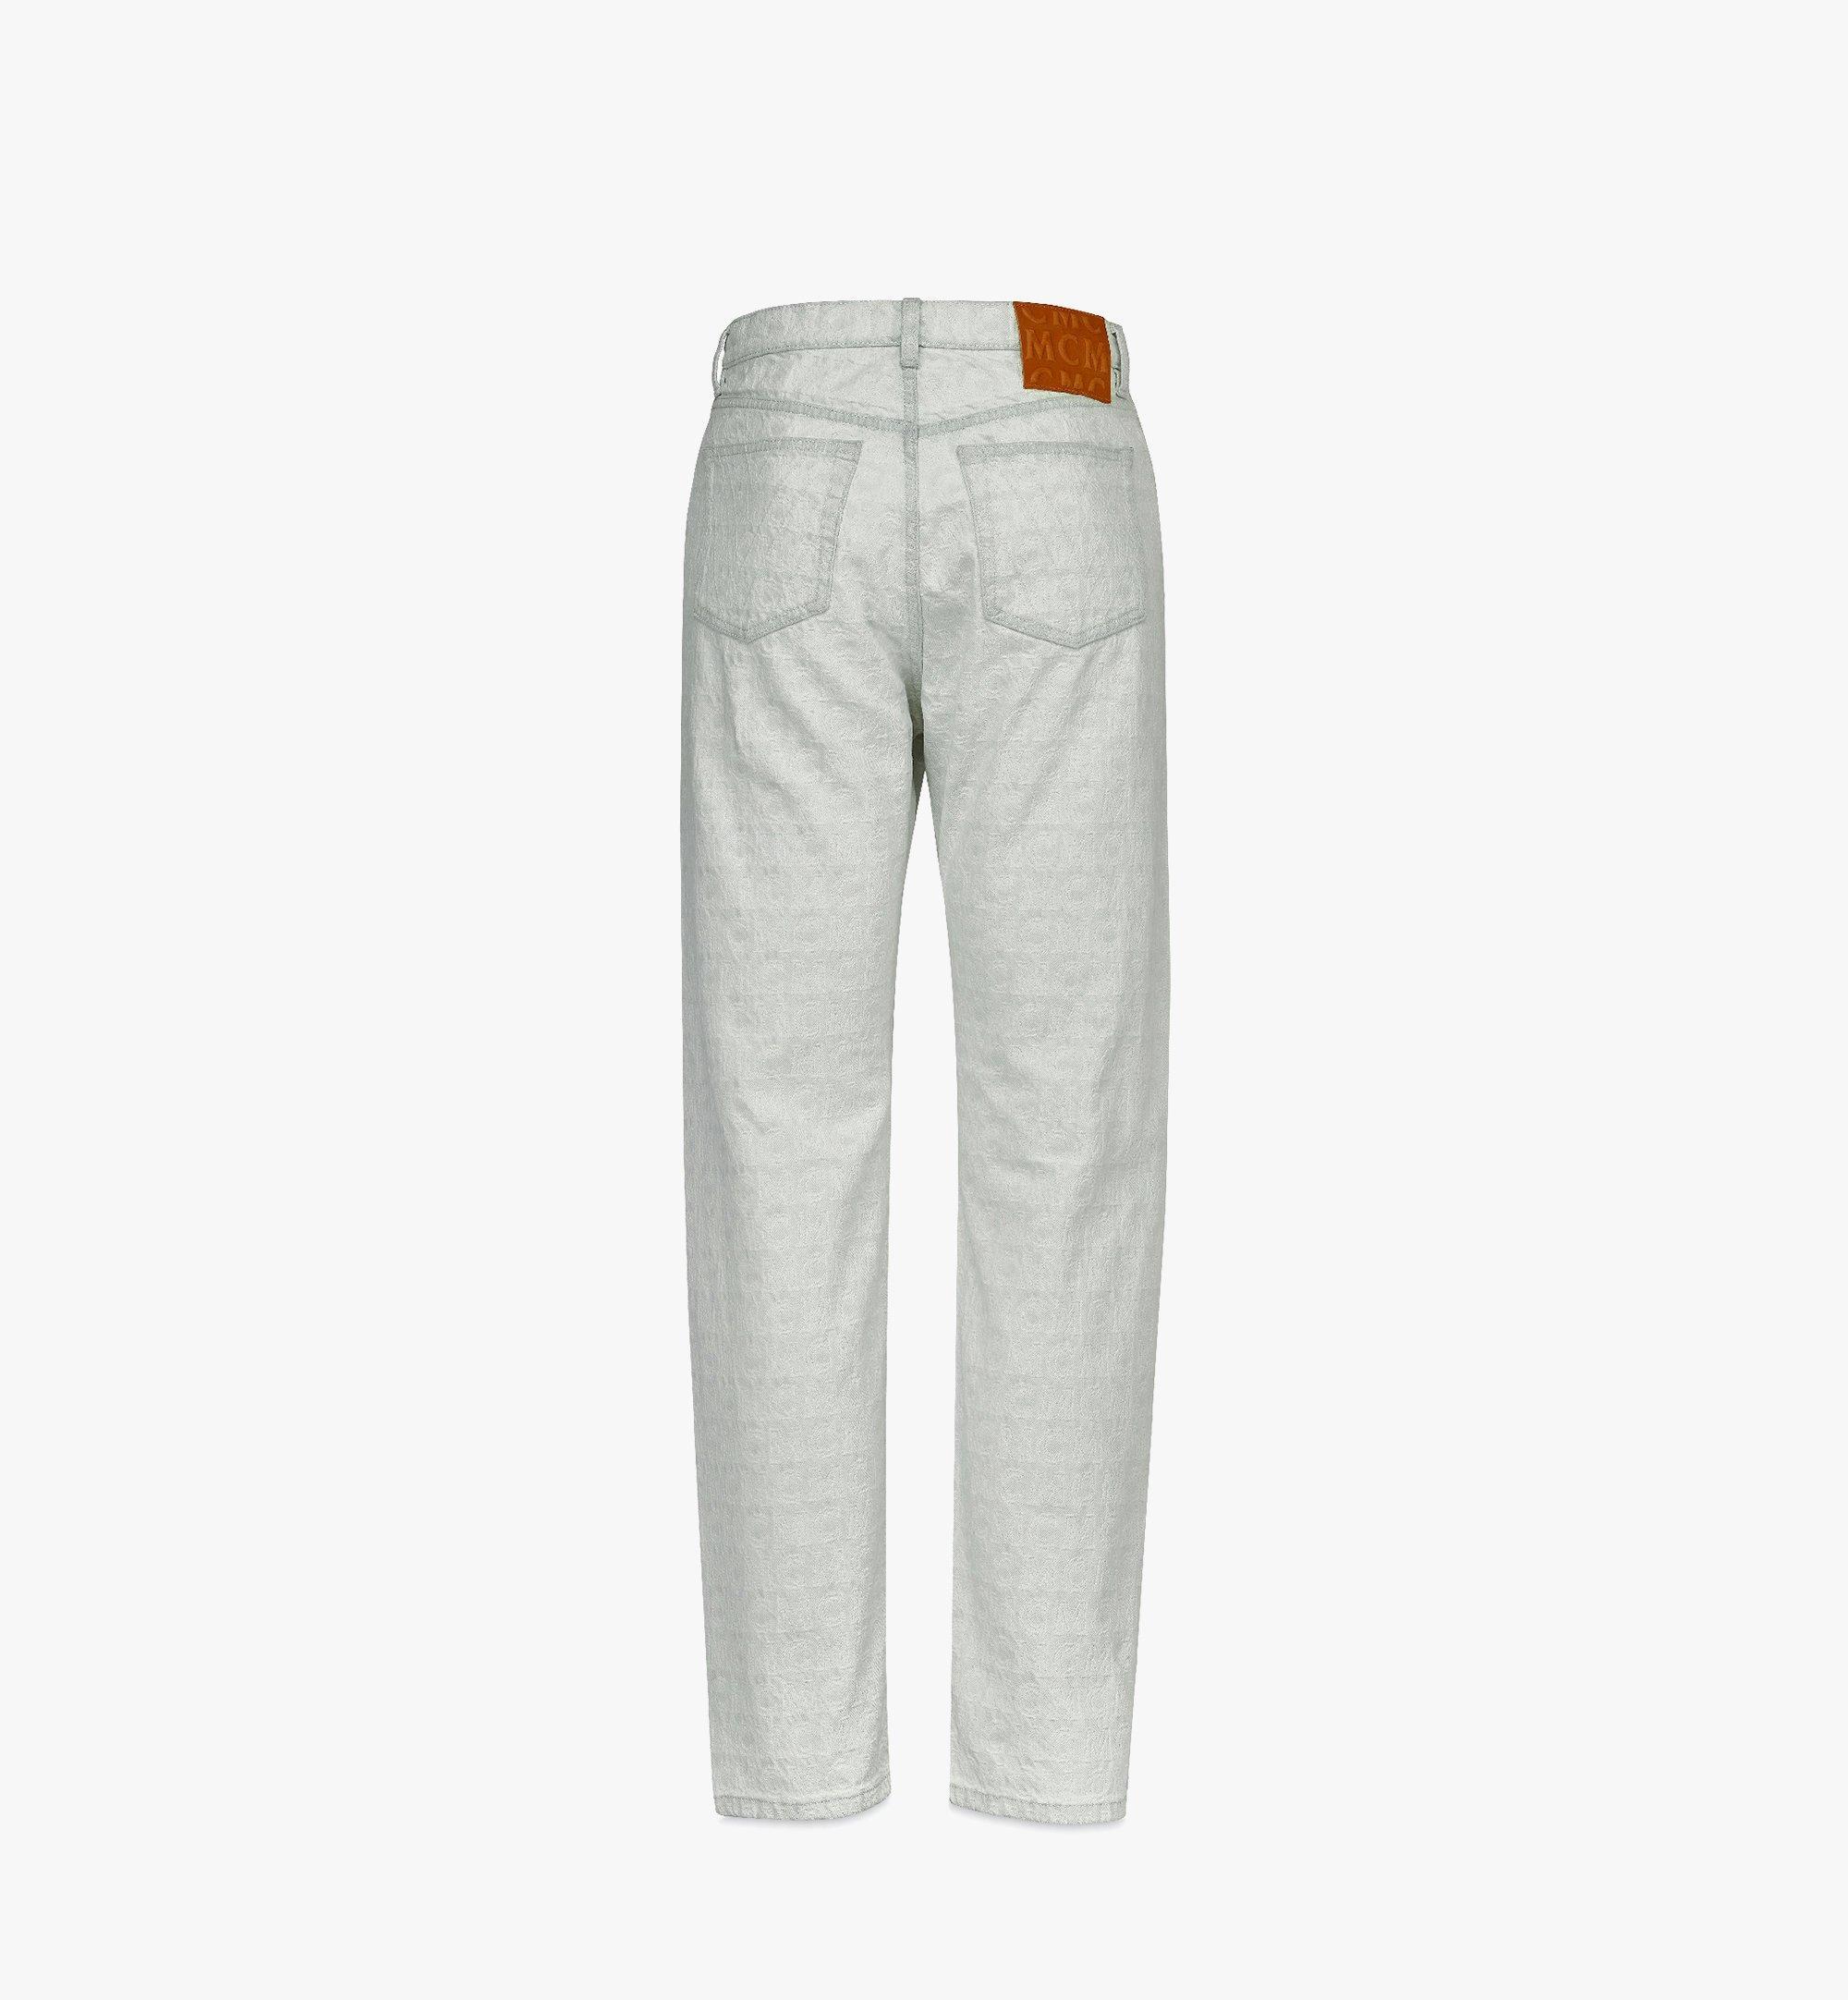 MCM 男士经典花纹直筒牛仔裤 White MHPBSMM03WO046 更多视角 2